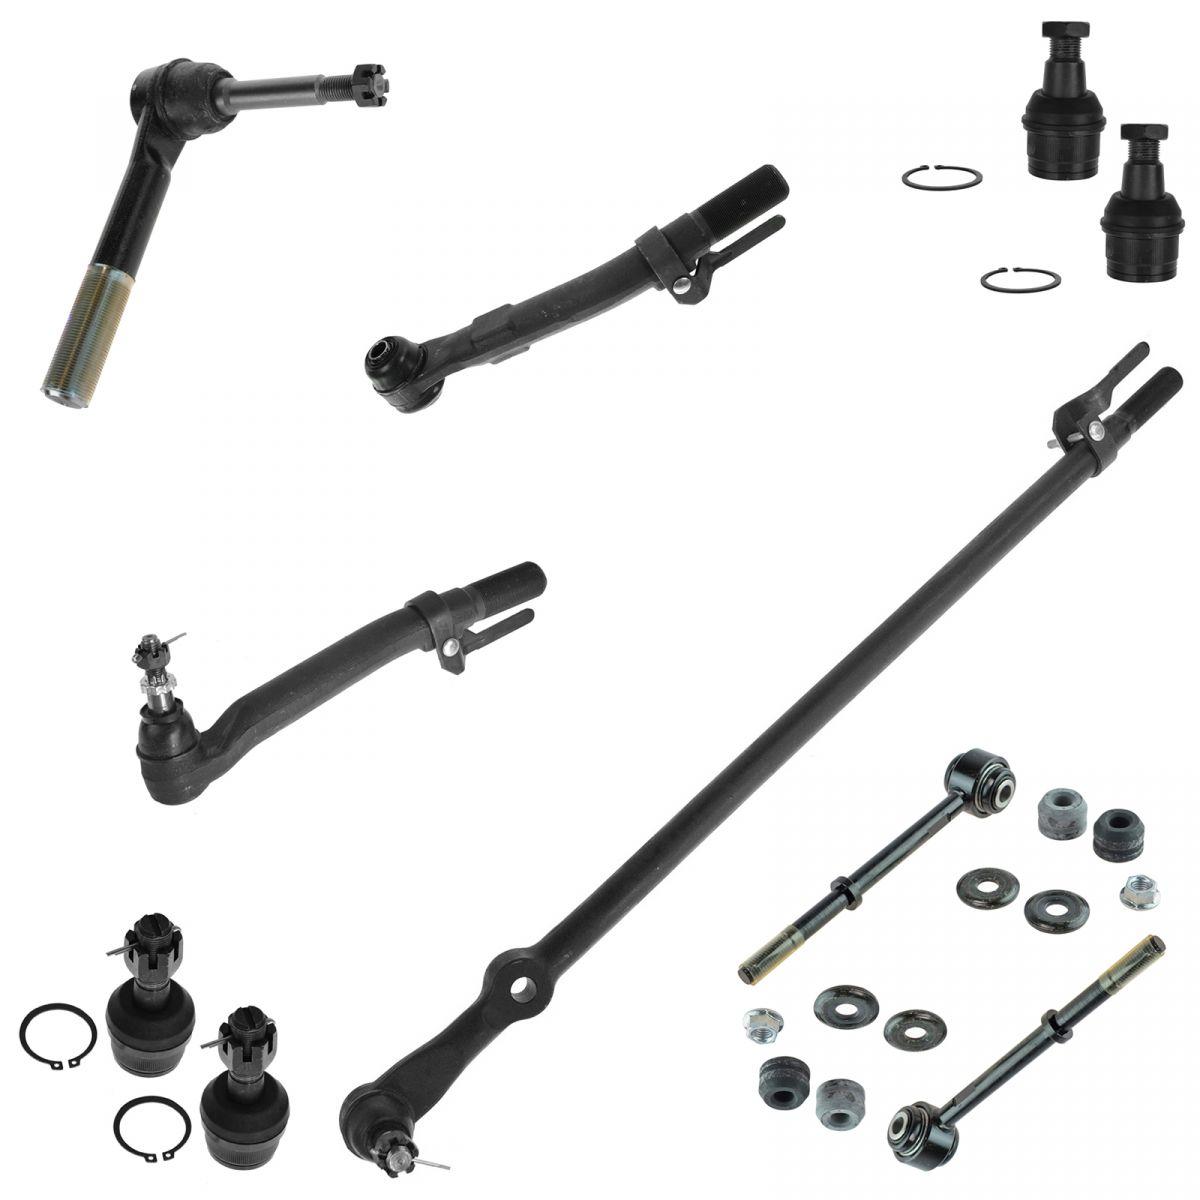 4 Piece Kit Tie Rod End Steering Drag Link LH RH Set for Ford Super Duty 4WD